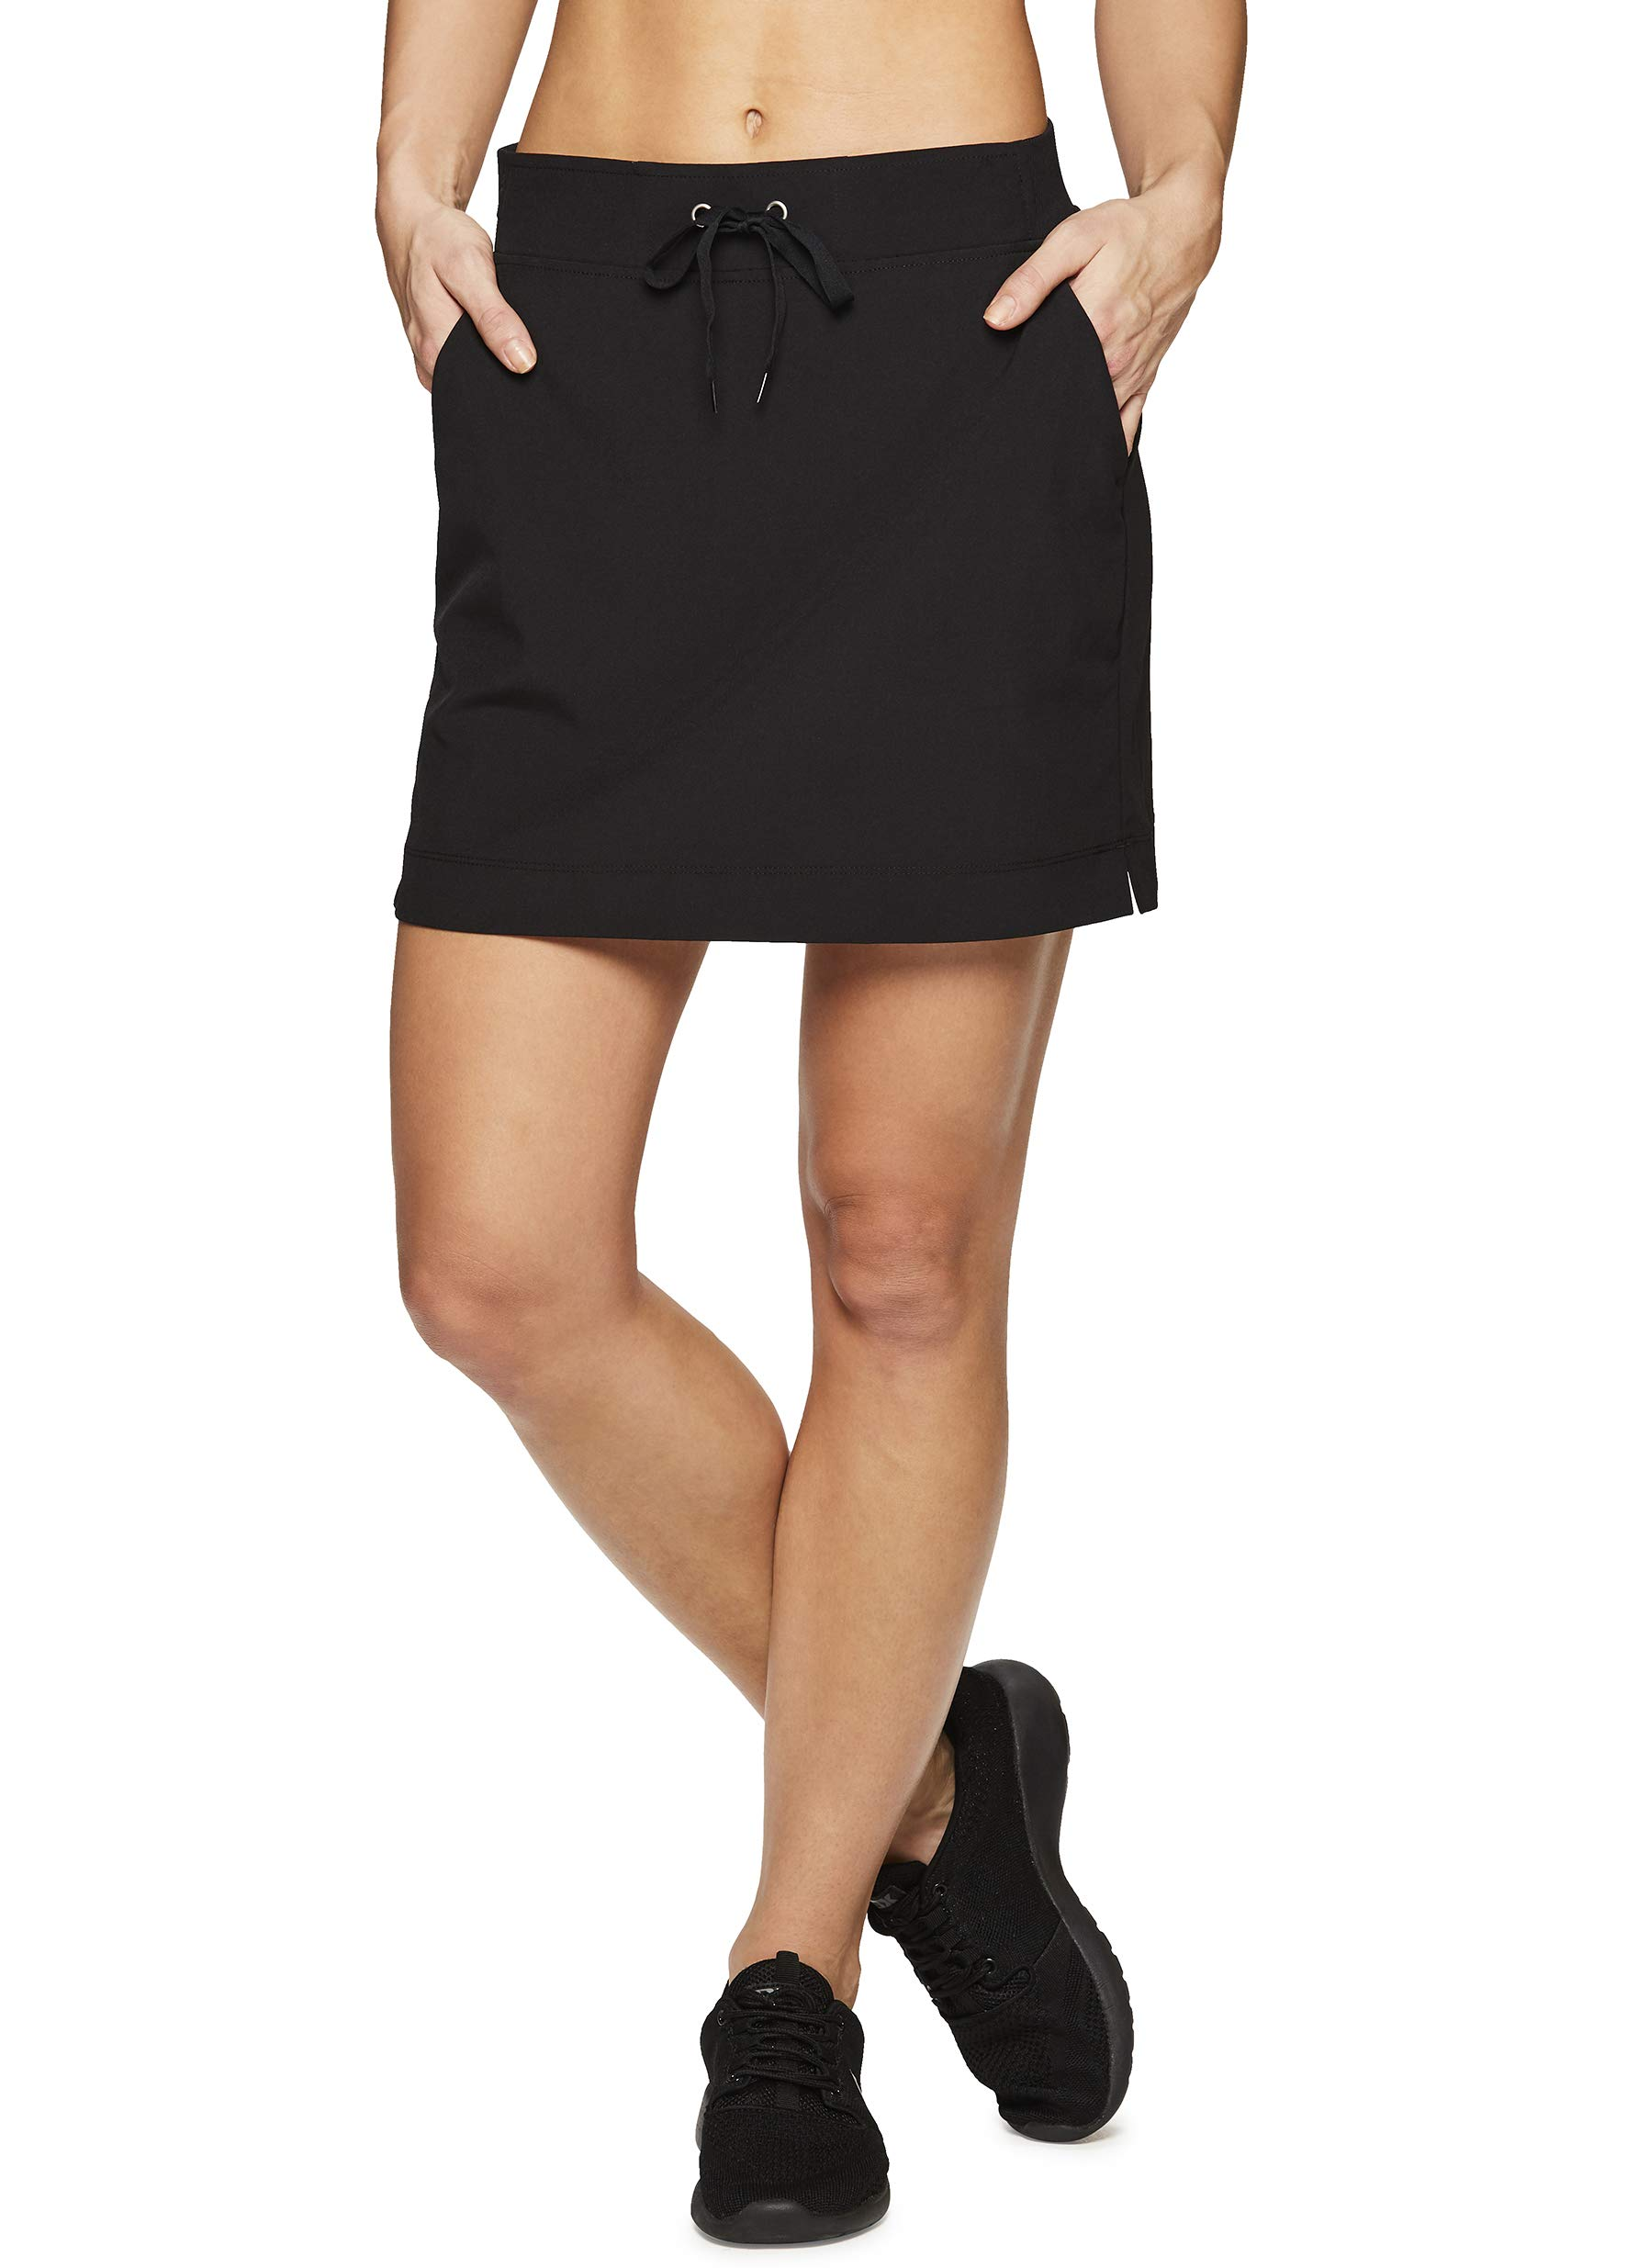 RBX Active Women's Golf/Tennis Athletic Skort with Bike Shorts S19 Black S